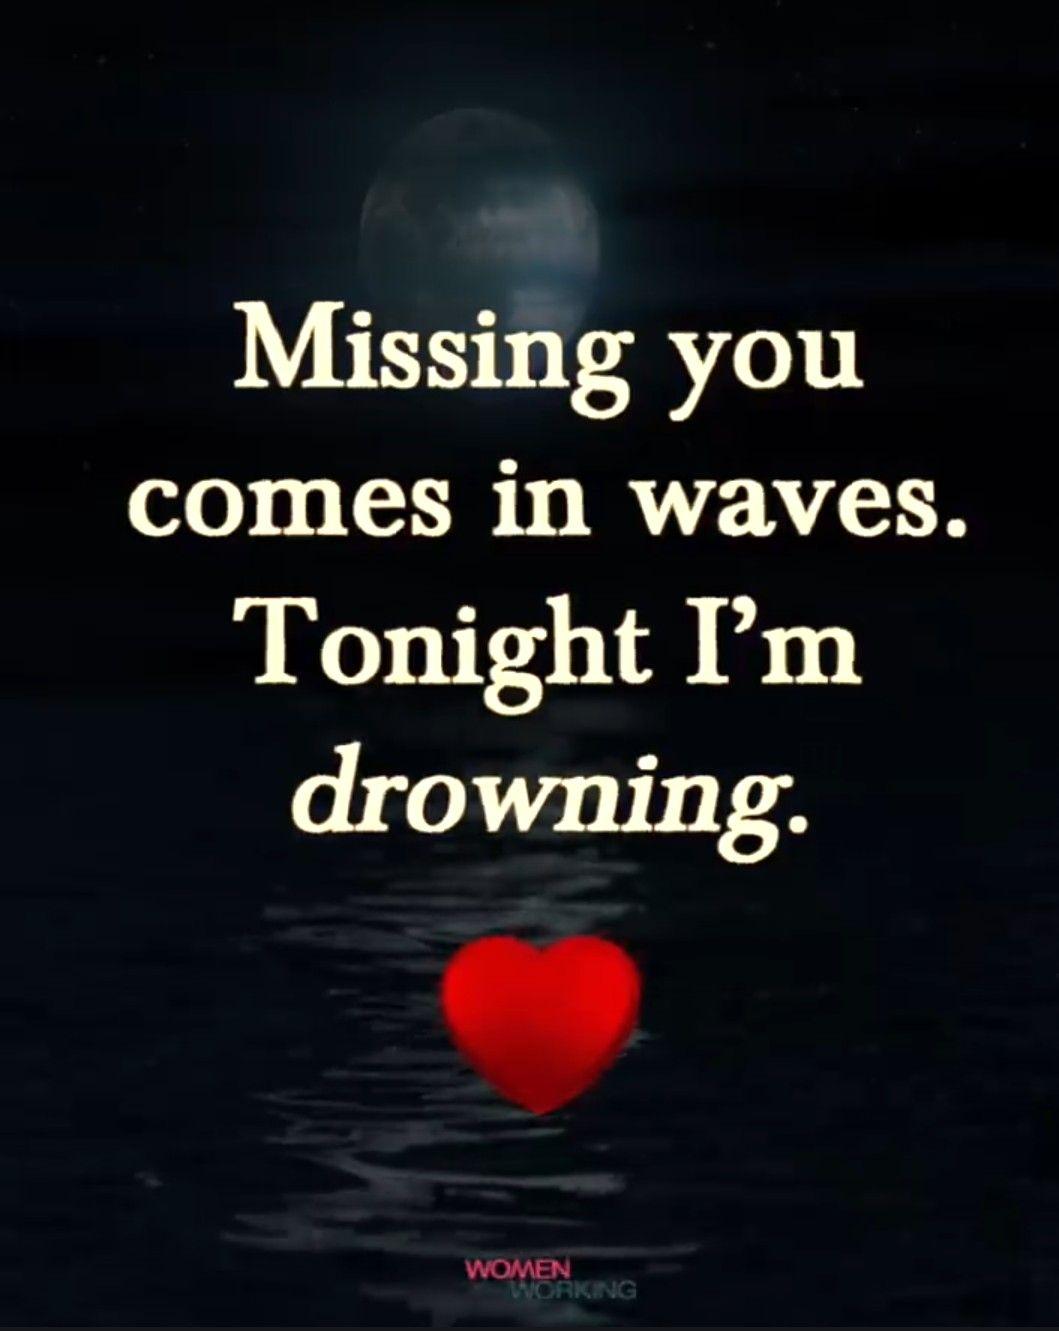 Please throw me a life jacket. I love BEAUTIFUL!